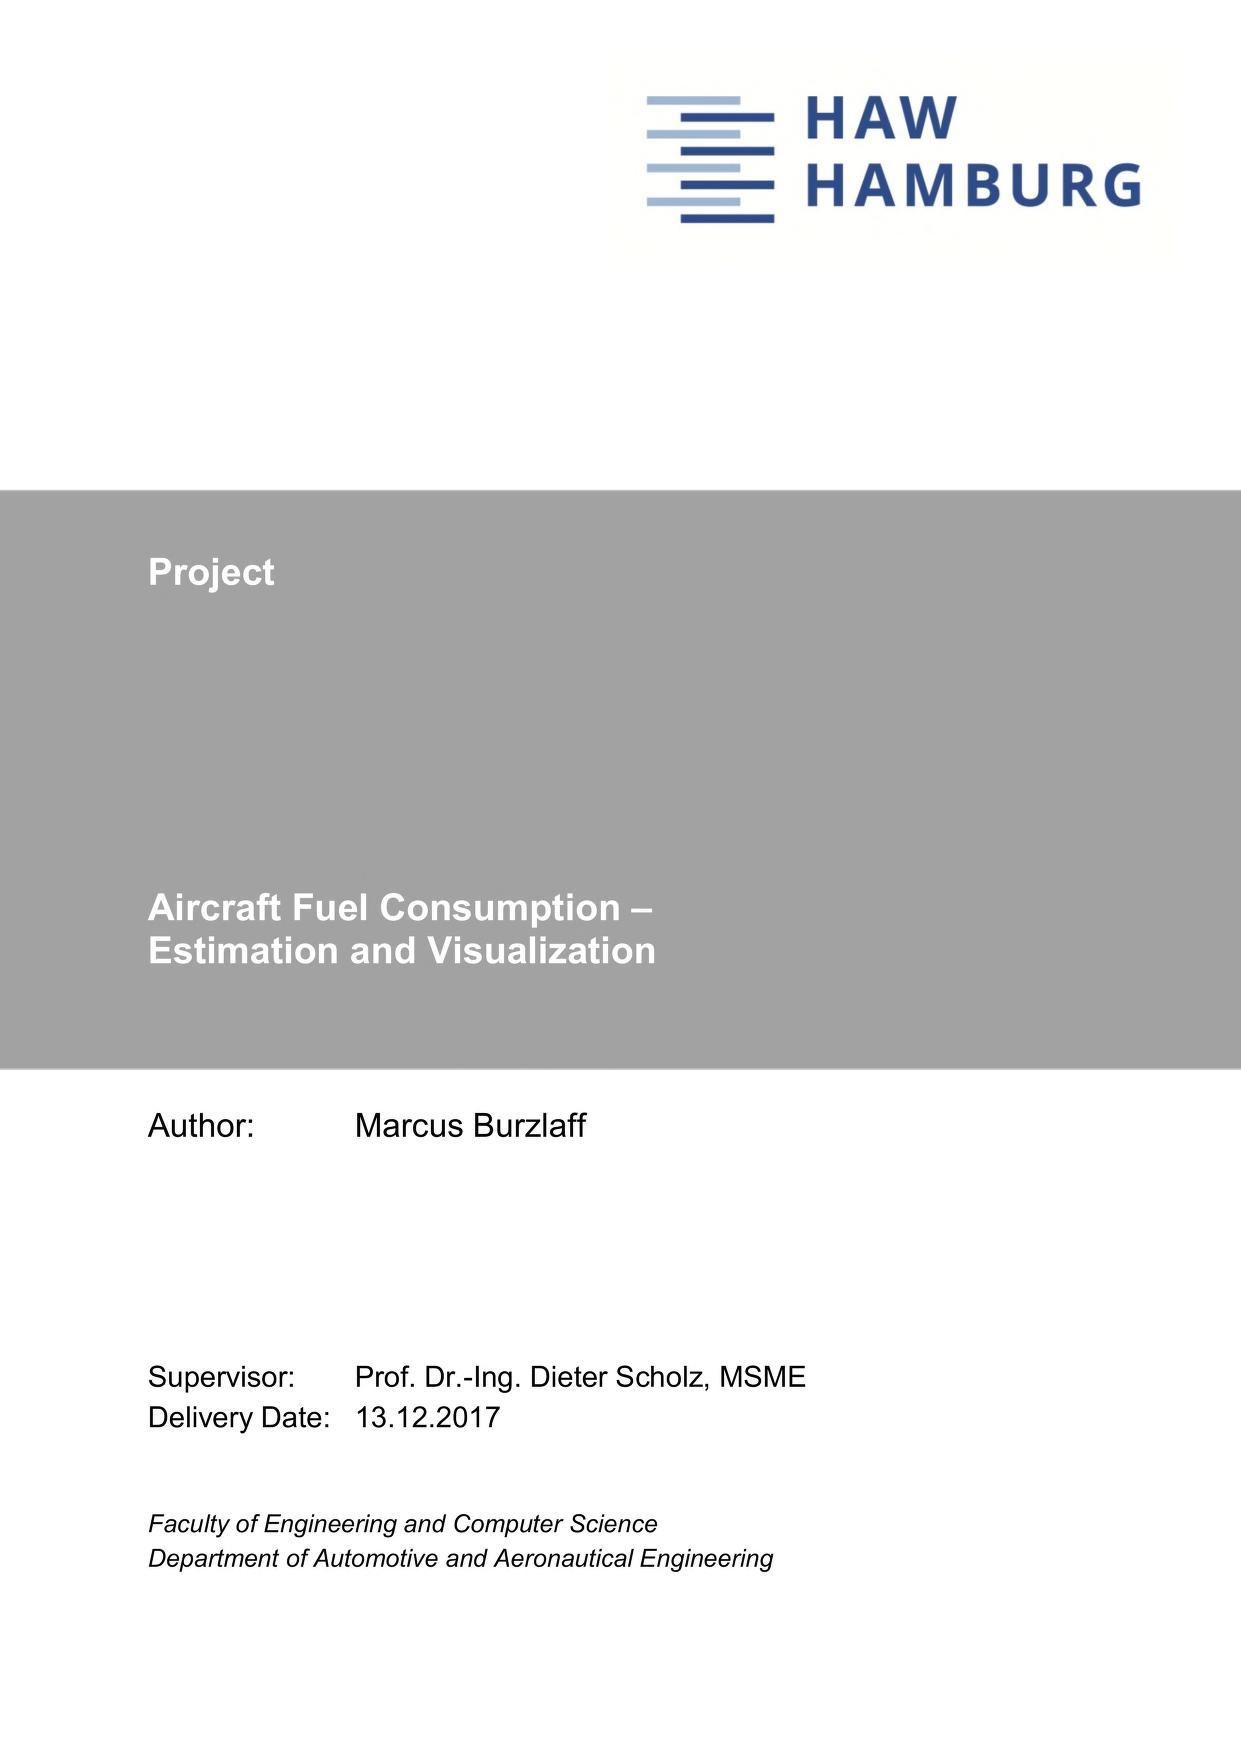 Thumbnail image ofAircraft Fuel Consumption - Estimation and Visualization